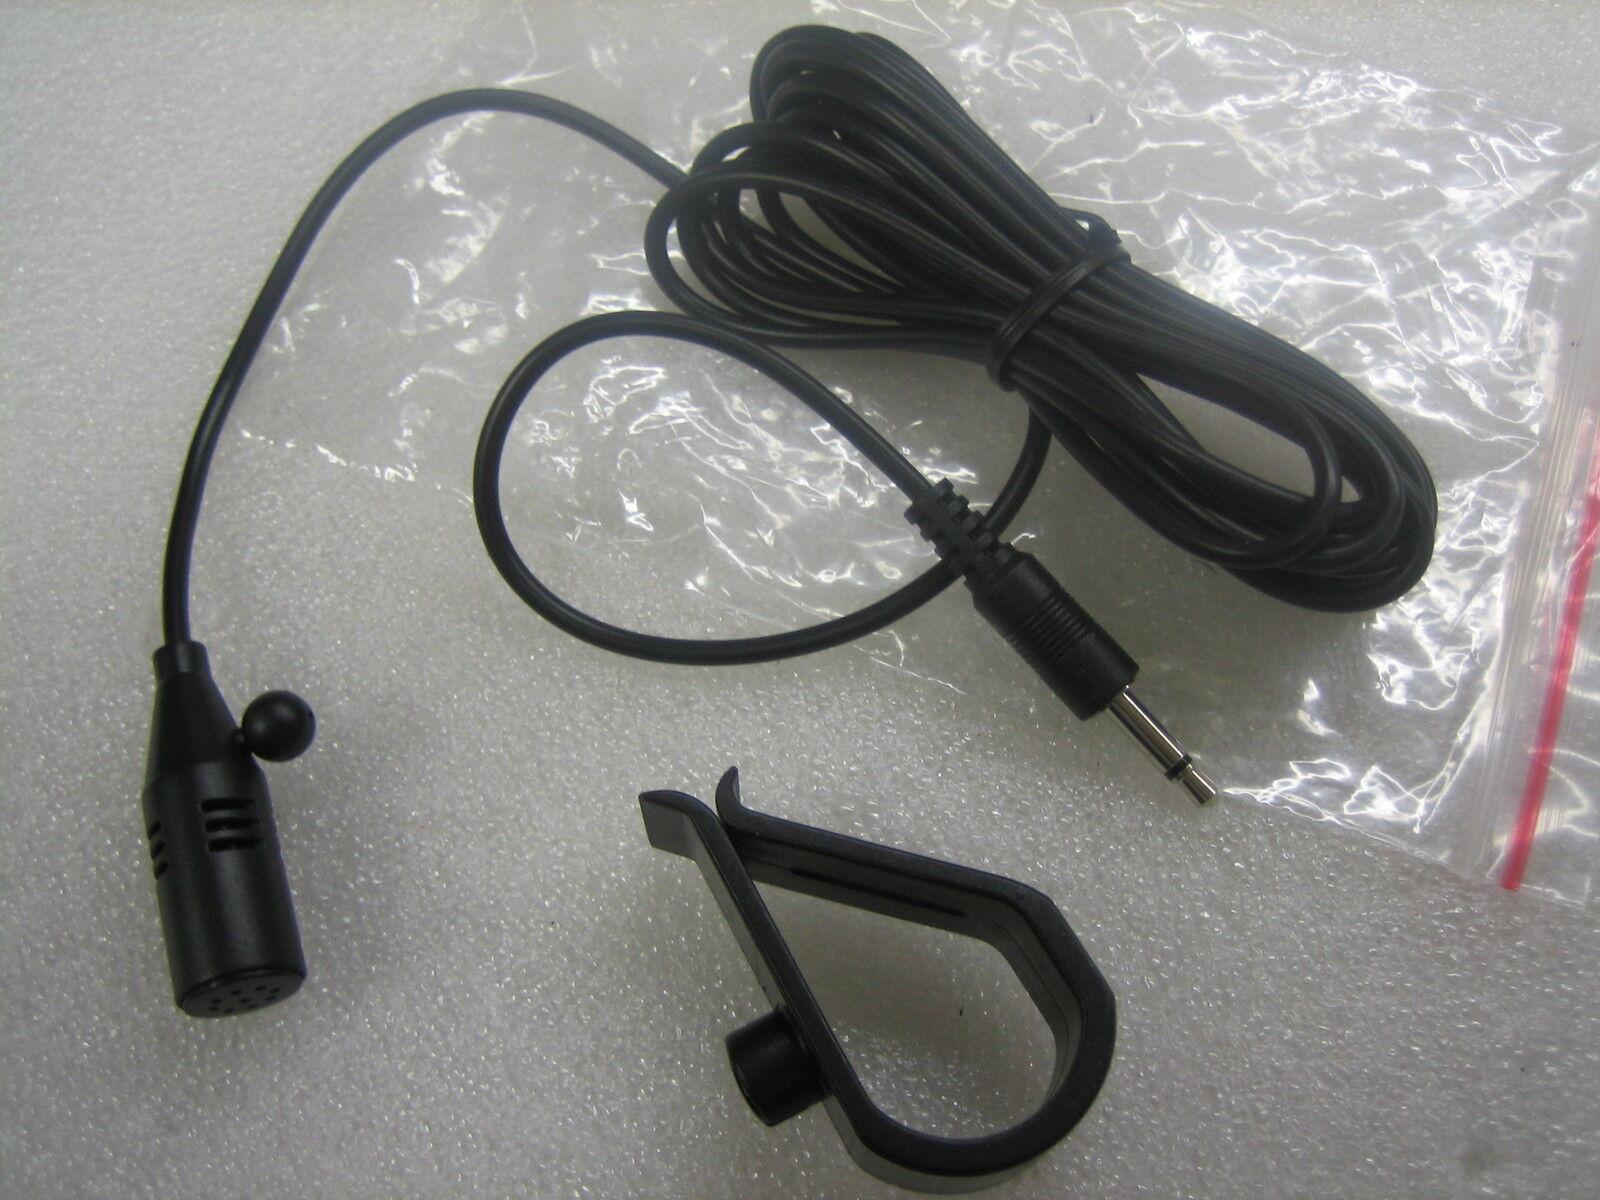 Pioneer Bluetooth Microphone Avic-z130bt,avic-z140bh,deh-p7000bt